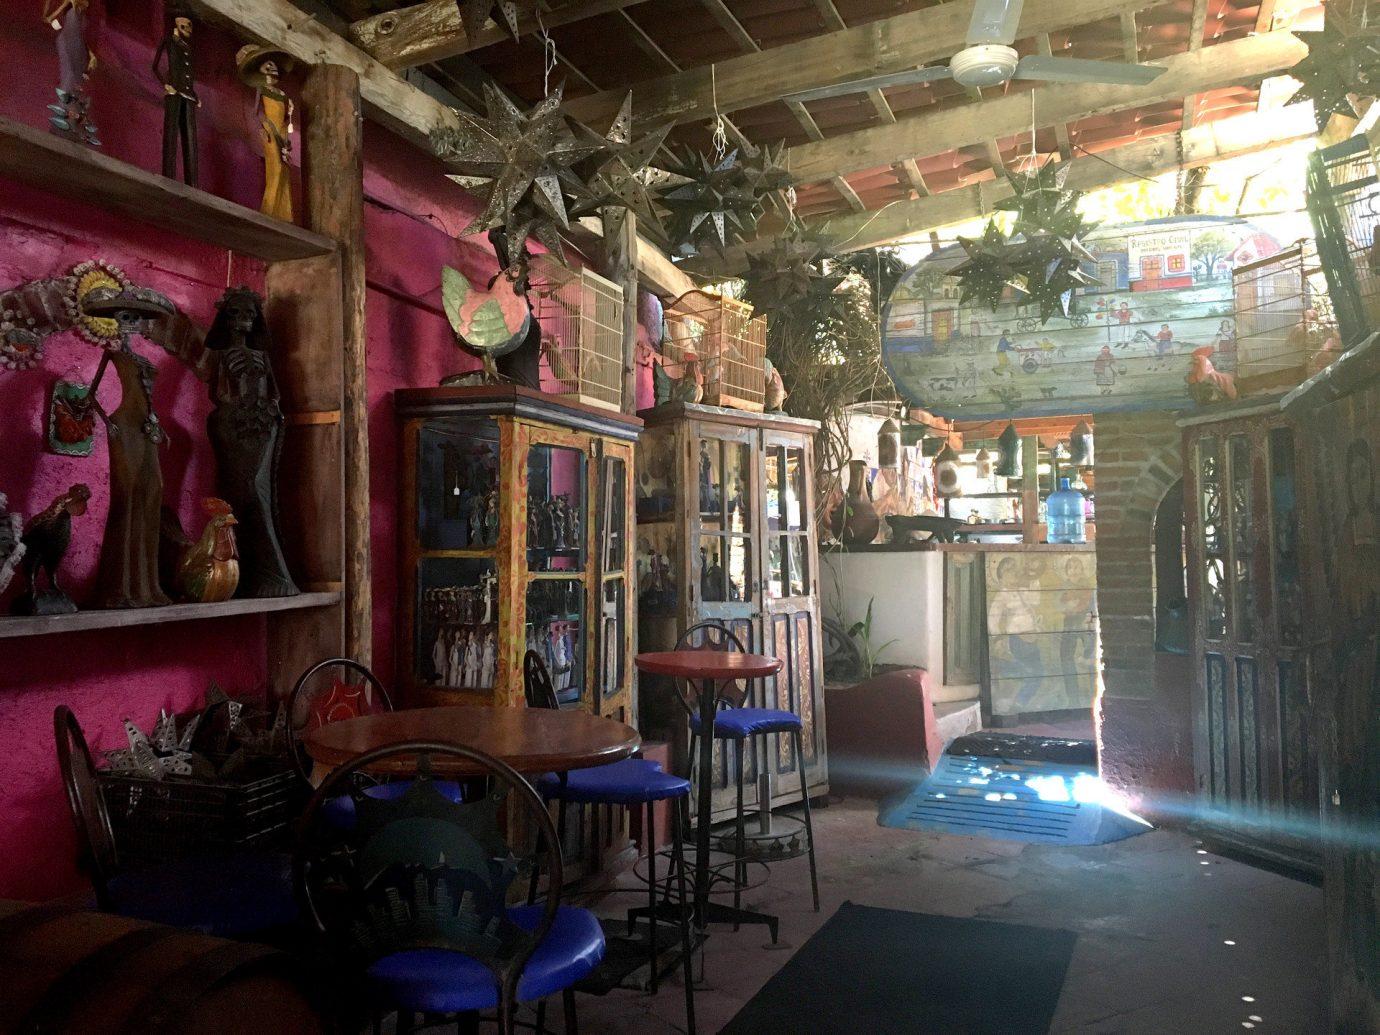 artistic artsy Boutique charming interior quaint Rustic Shop store trendy Trip Ideas indoor room Living Bar tourist attraction interior design furniture area several